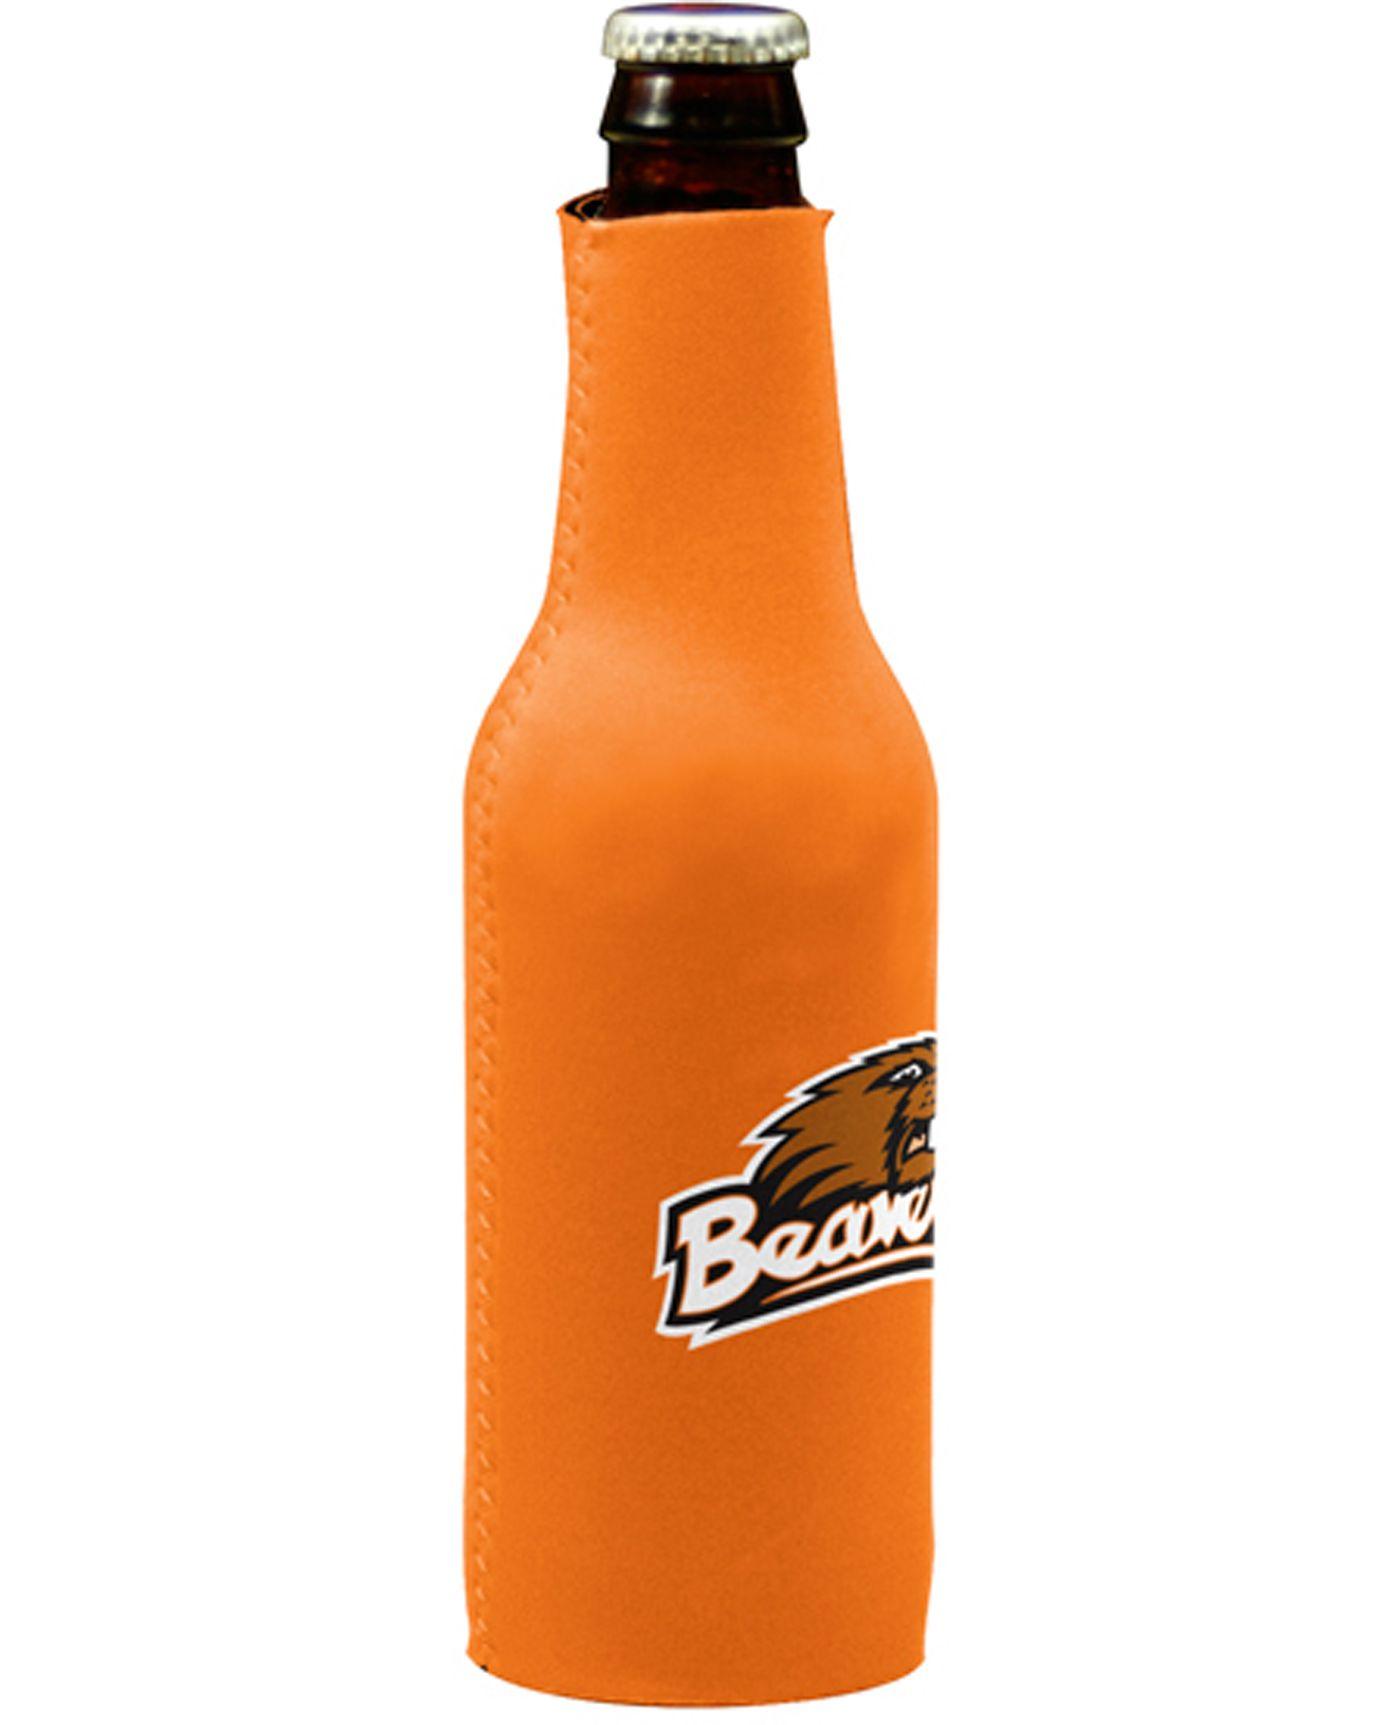 Oregon State Beavers Bottle Koozie